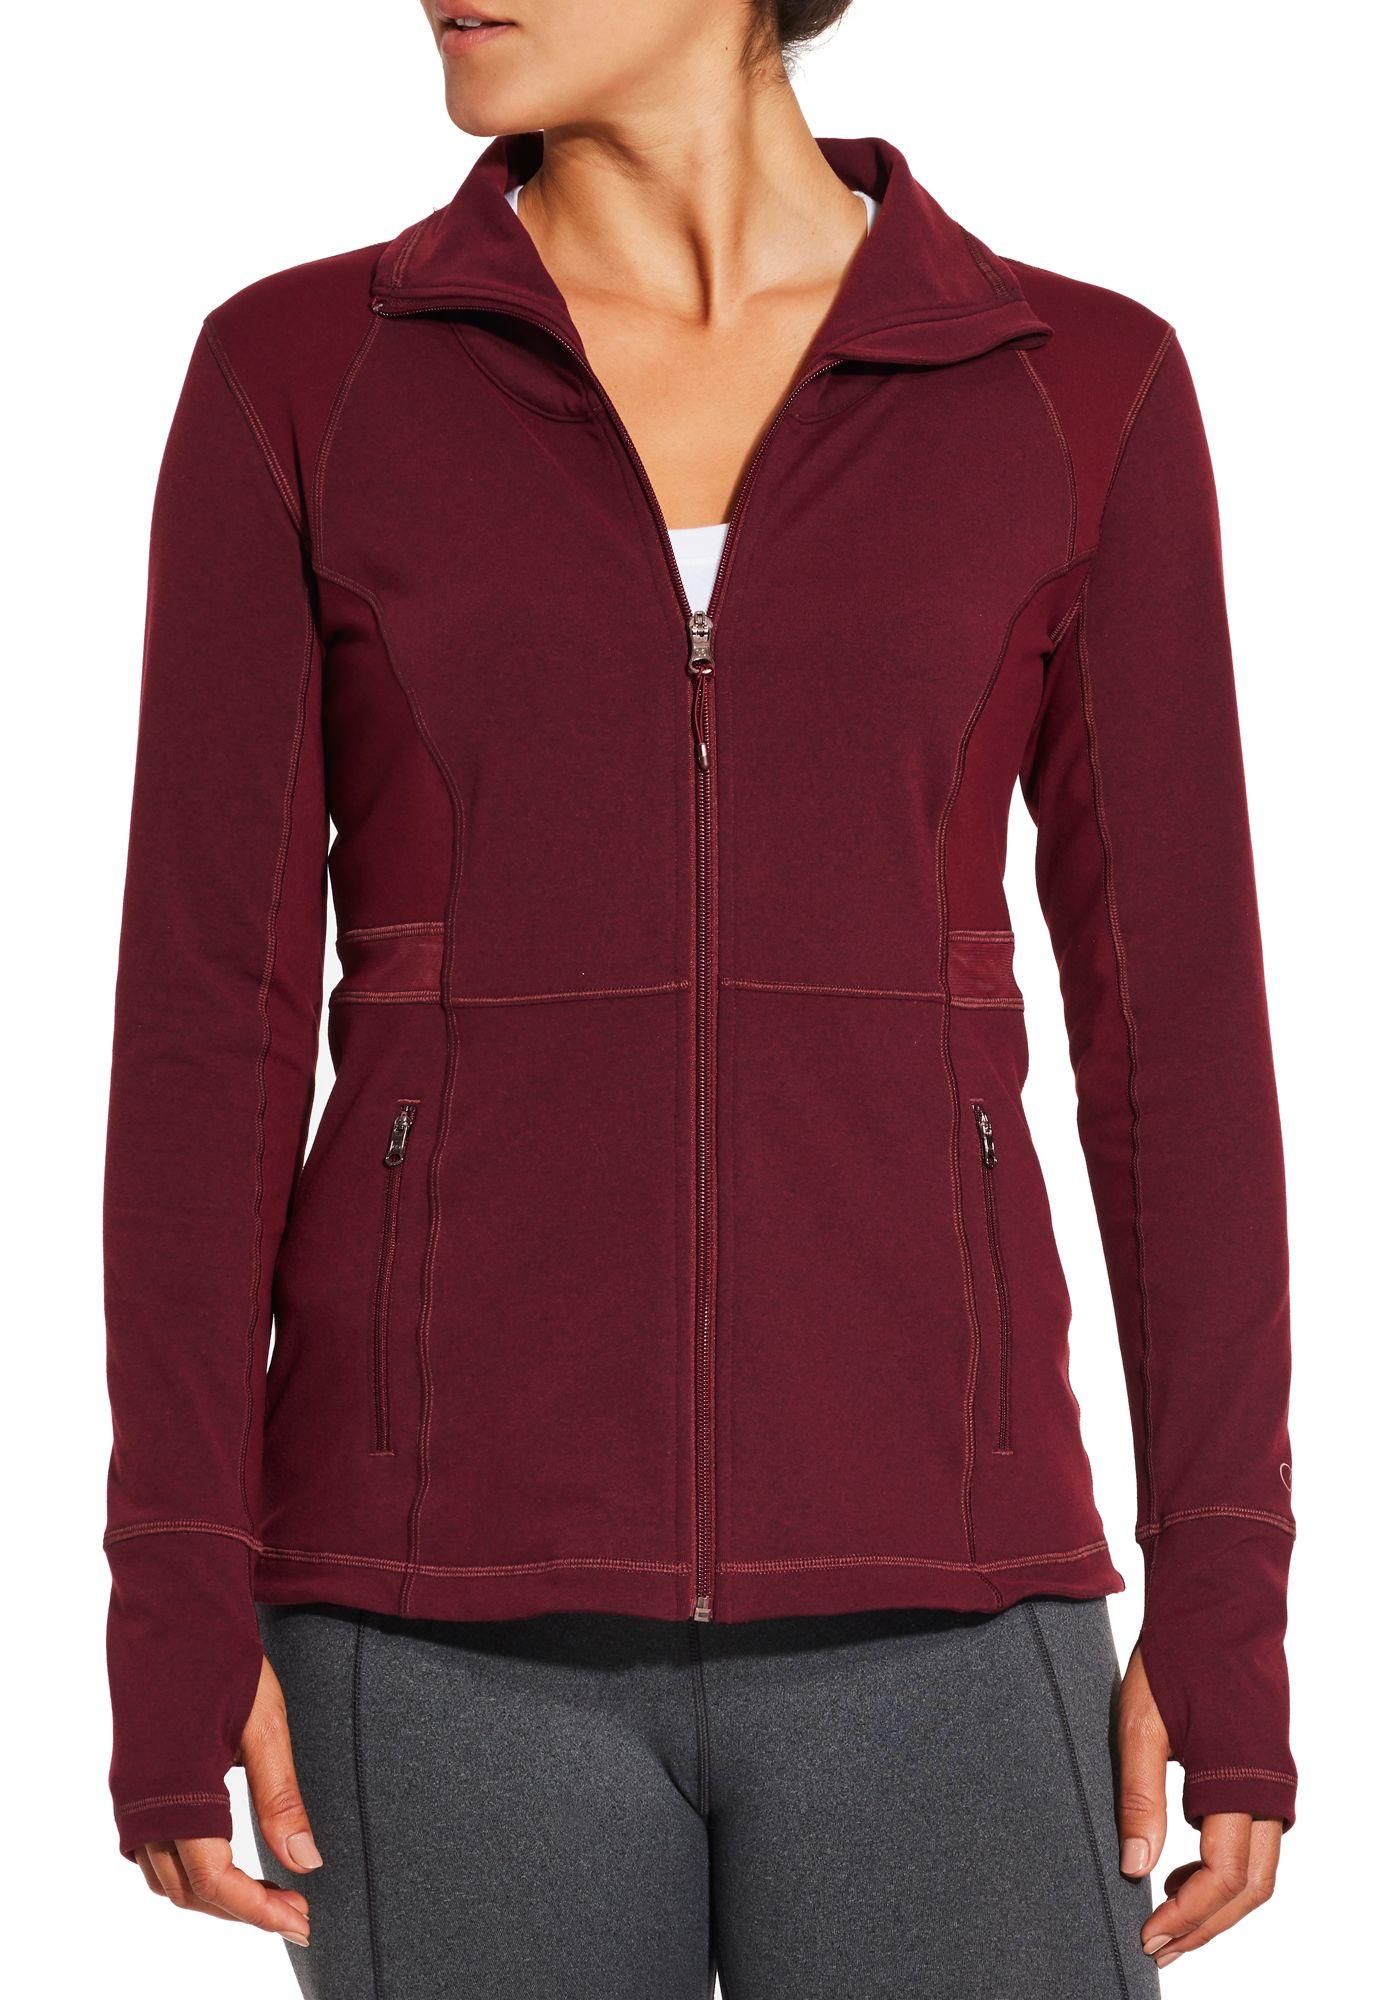 CALIA by Carrie Underwood Women's Core Heather Fitness Jacket